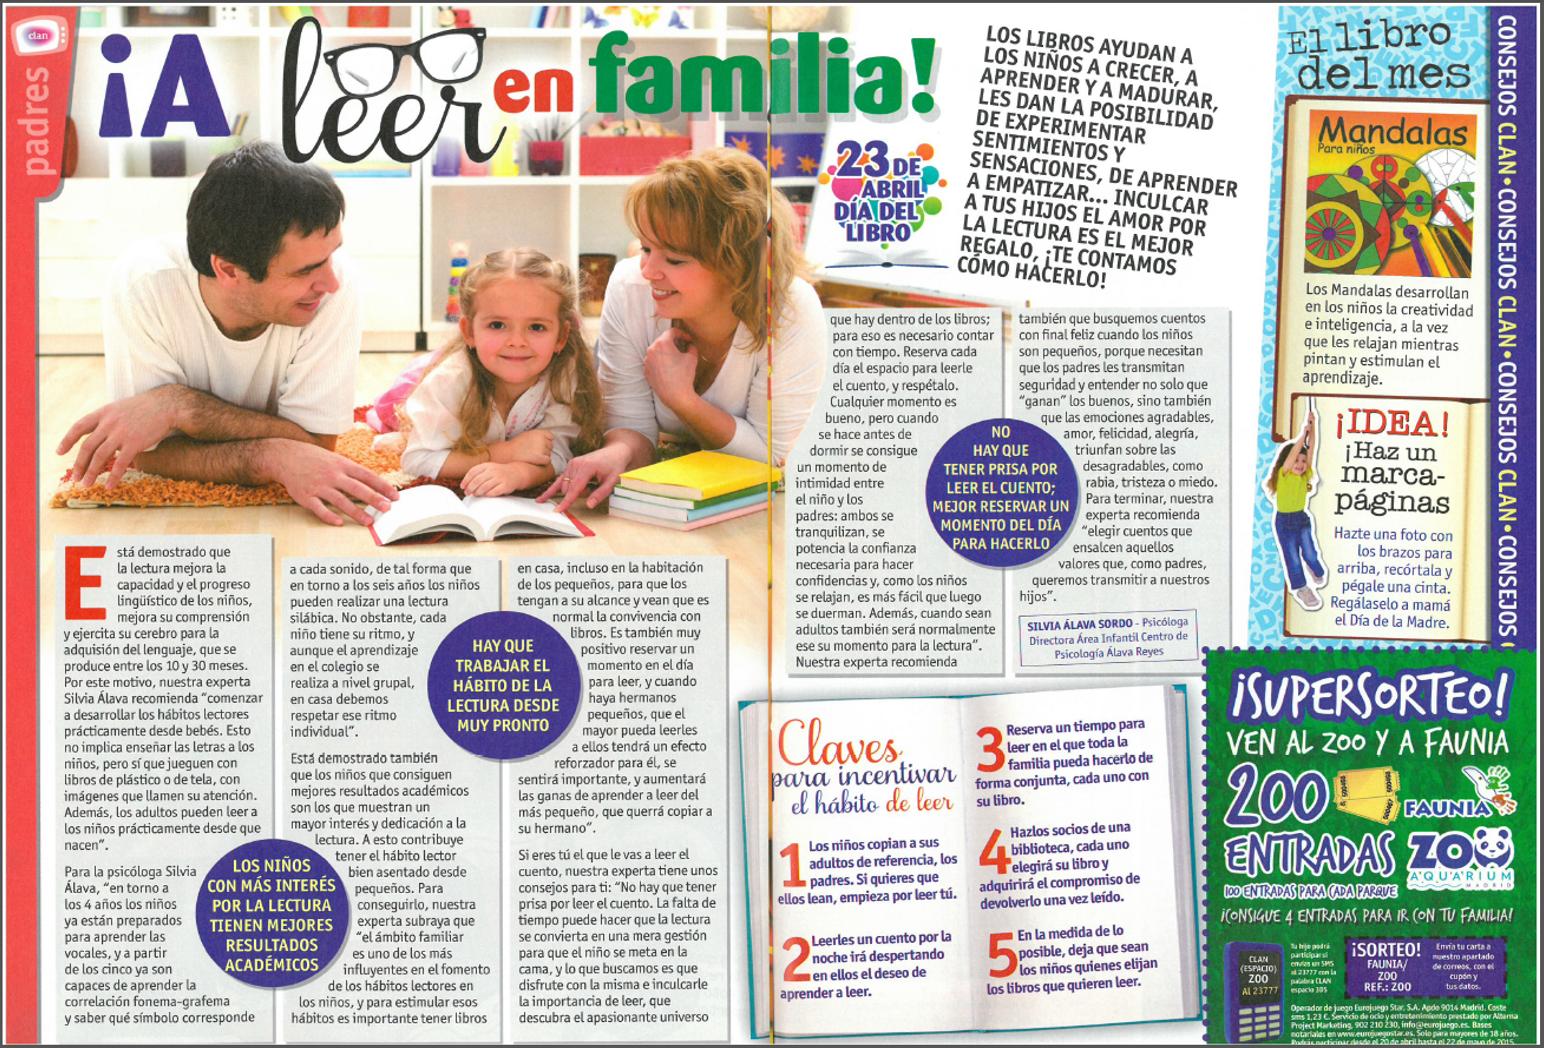 Leer en familia ClanTV